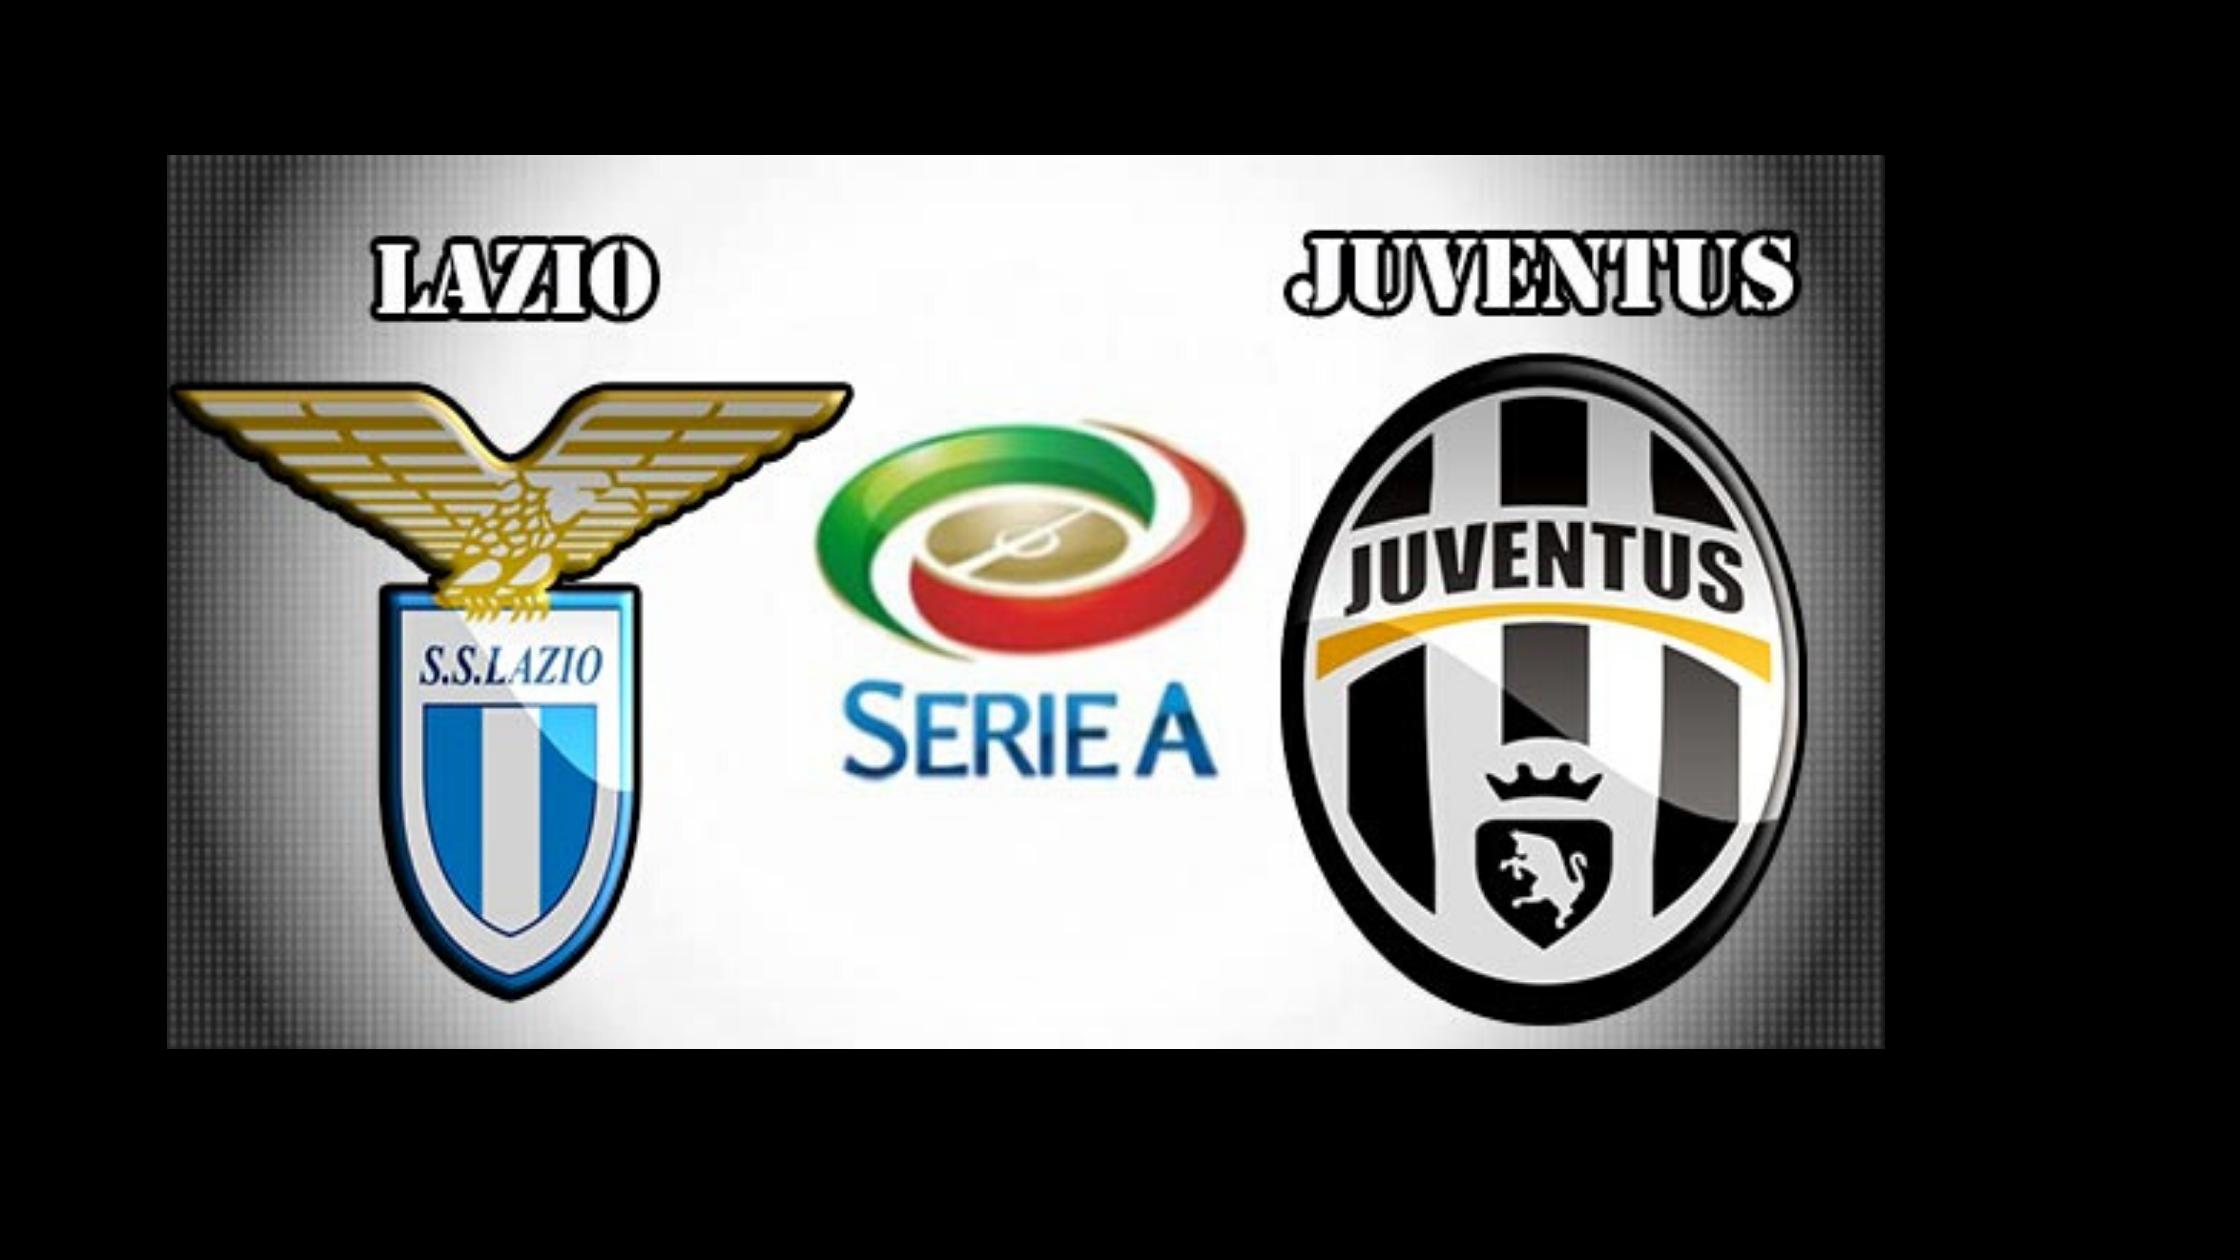 keo nha cai dem nay-Juve vs Lazio